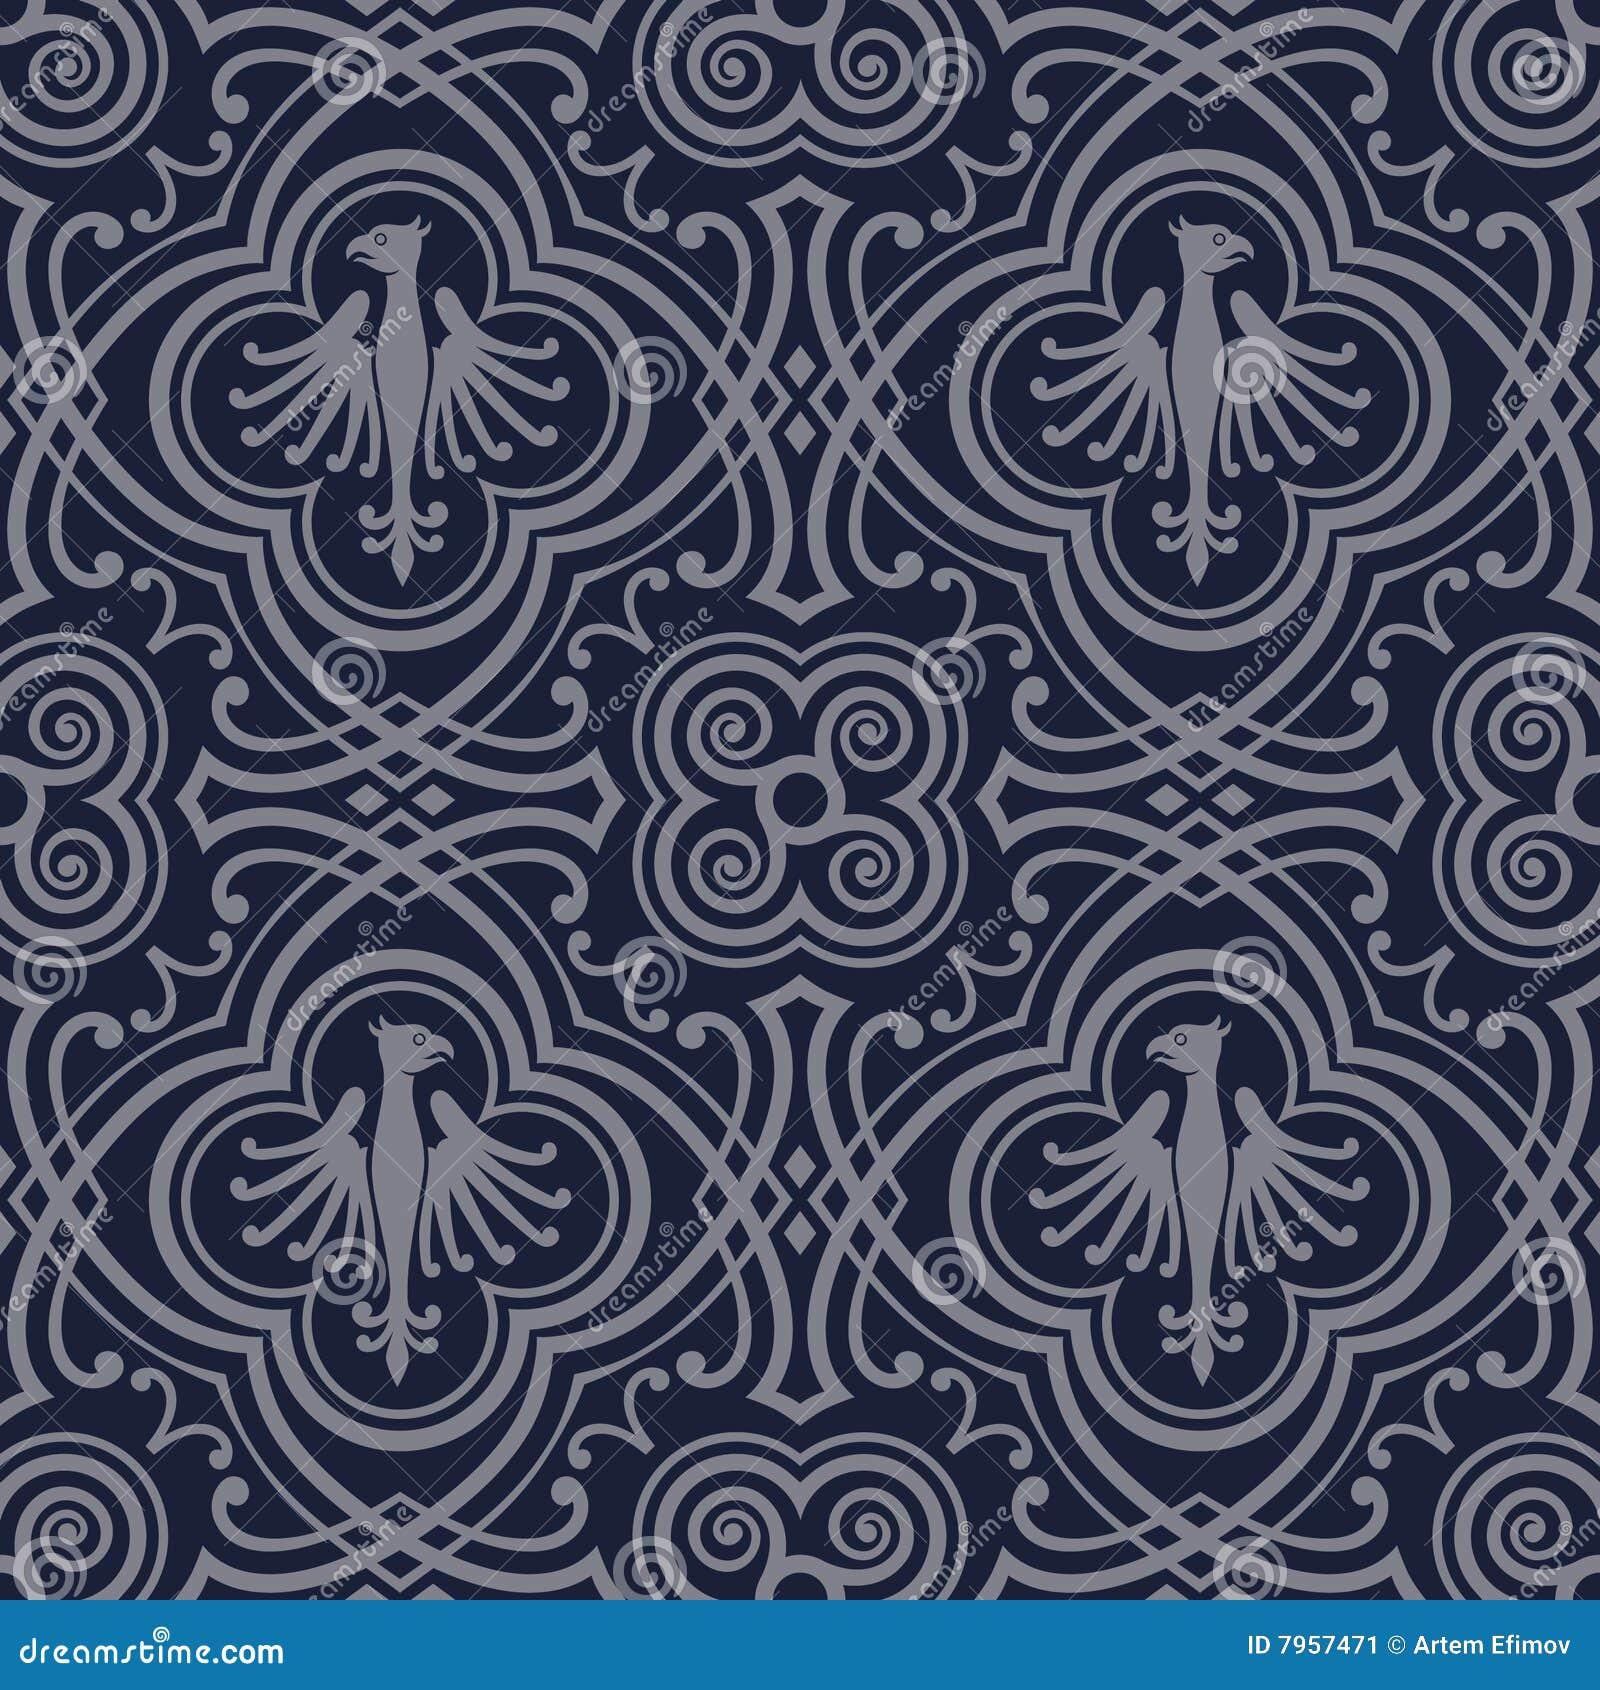 tile print wallpaper